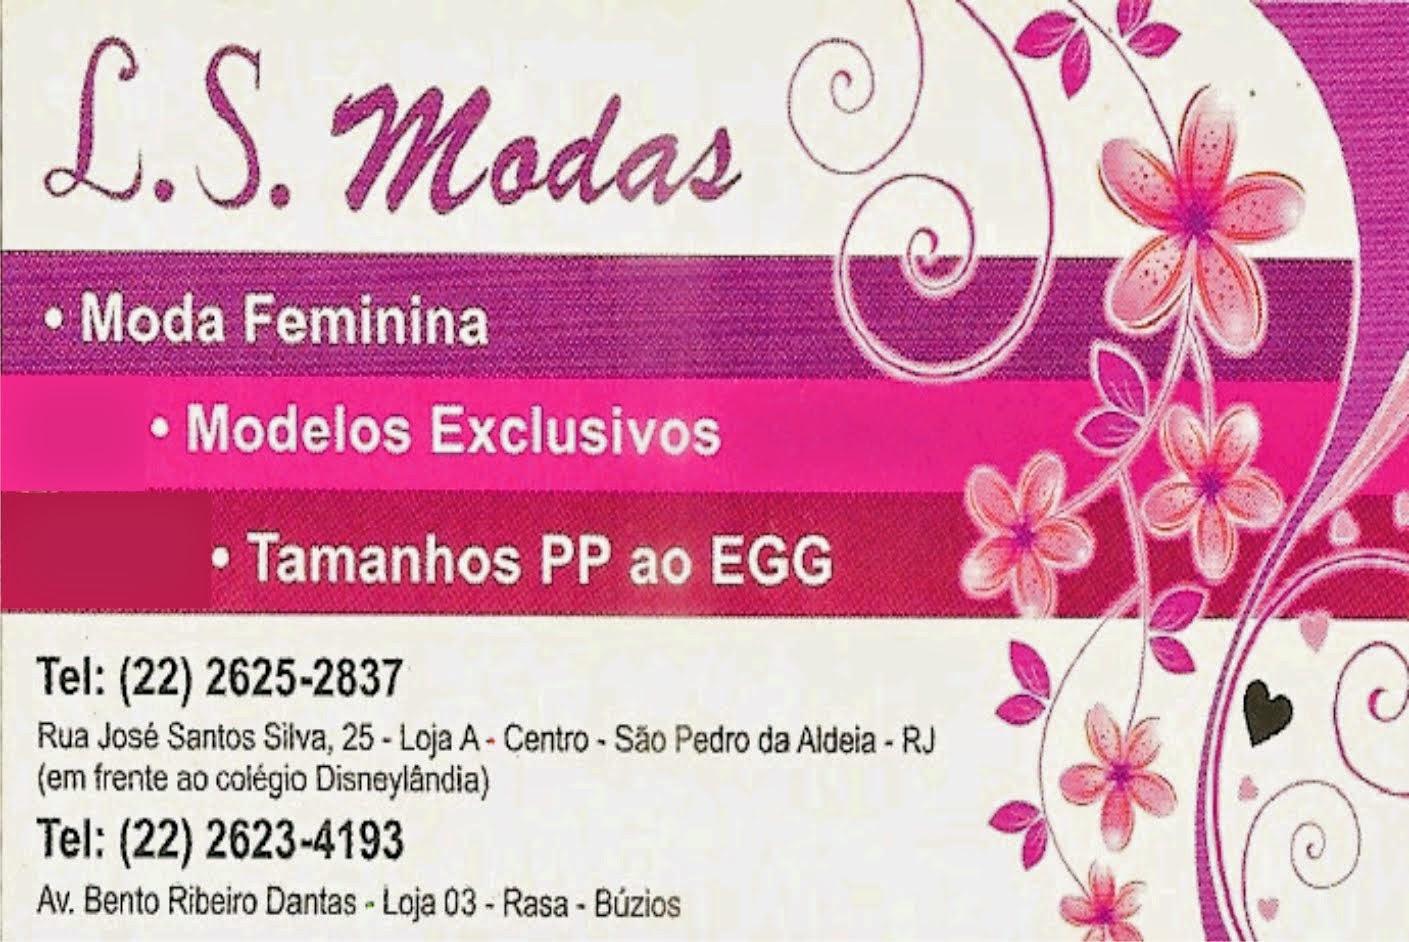 L.S. MODAS